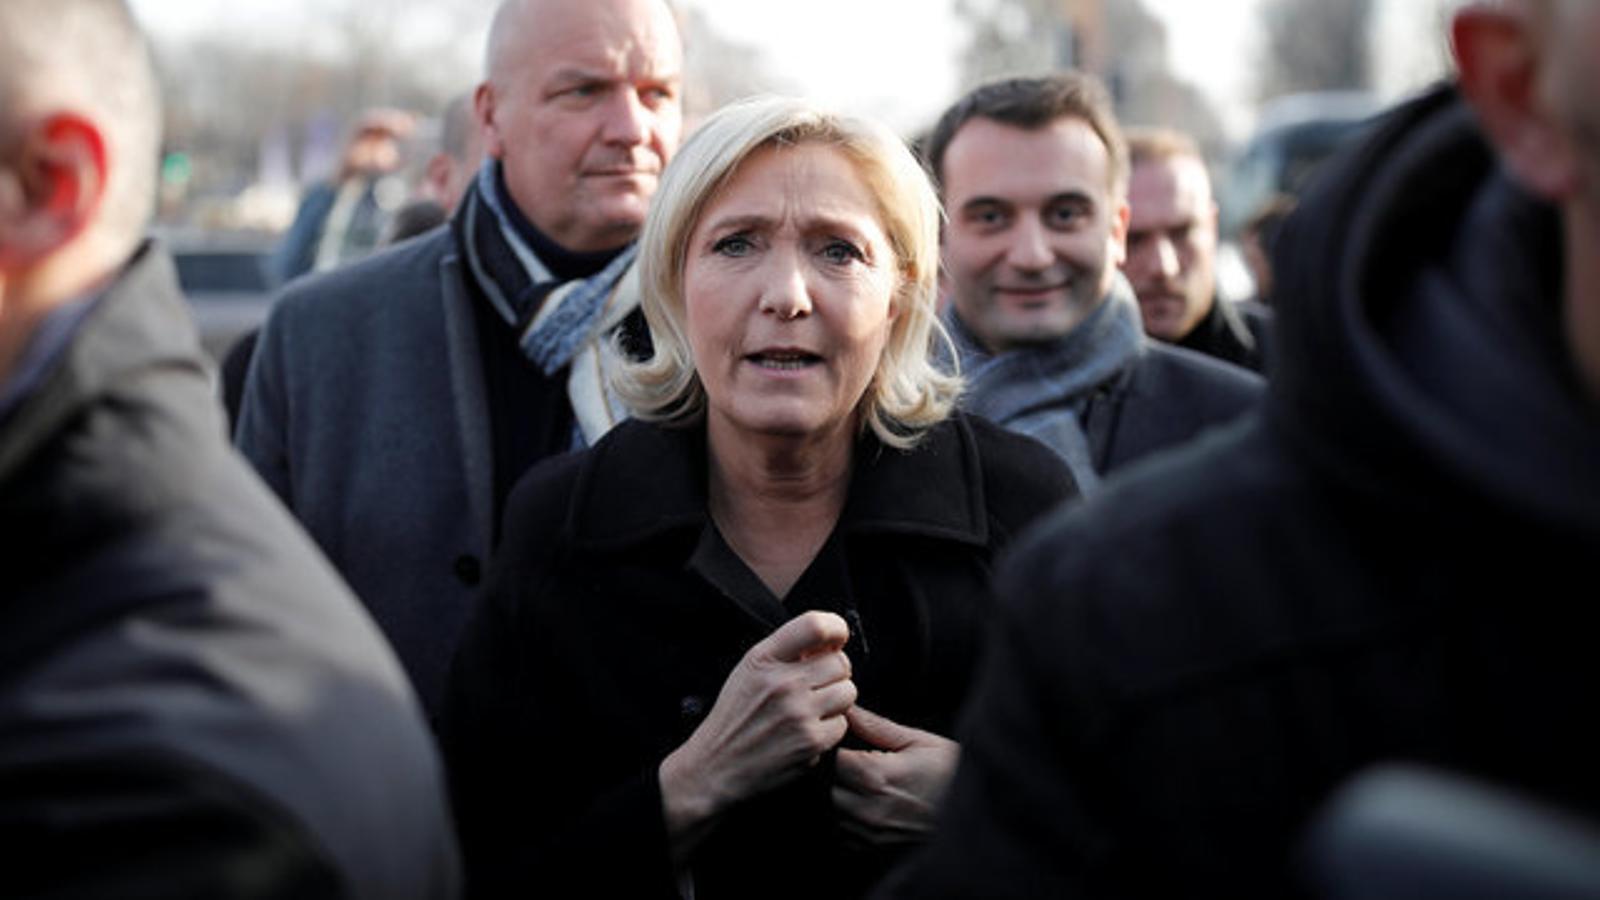 Le Pen en un mercat de Nadal a París aquest dijous.